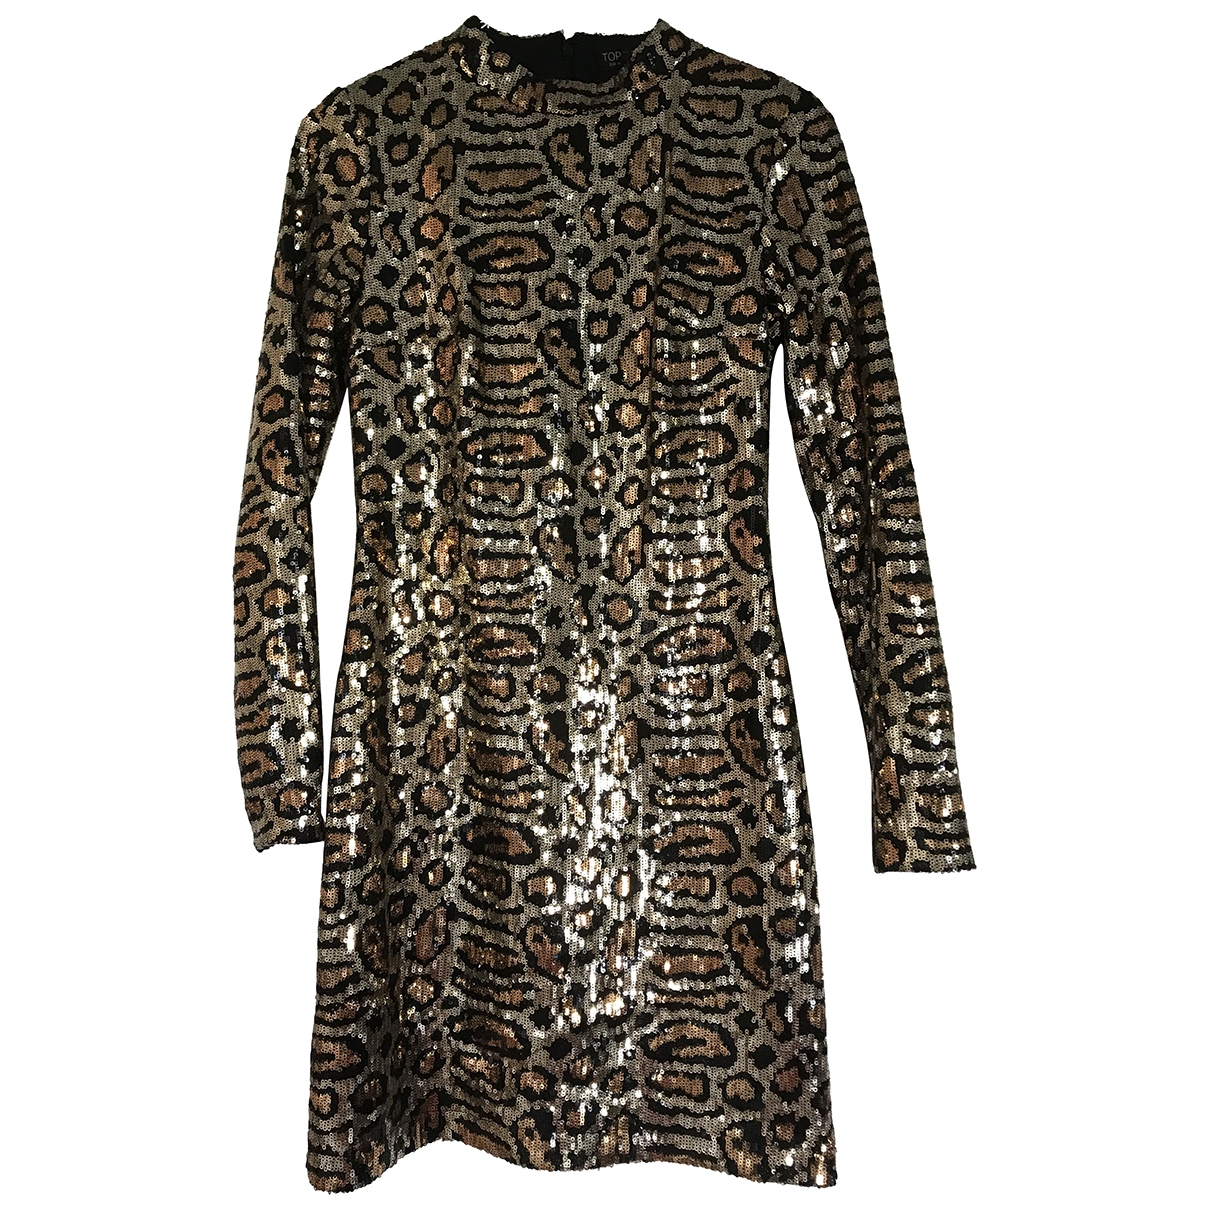 Tophop \N Kleid in  Metallic Mit Pailletten